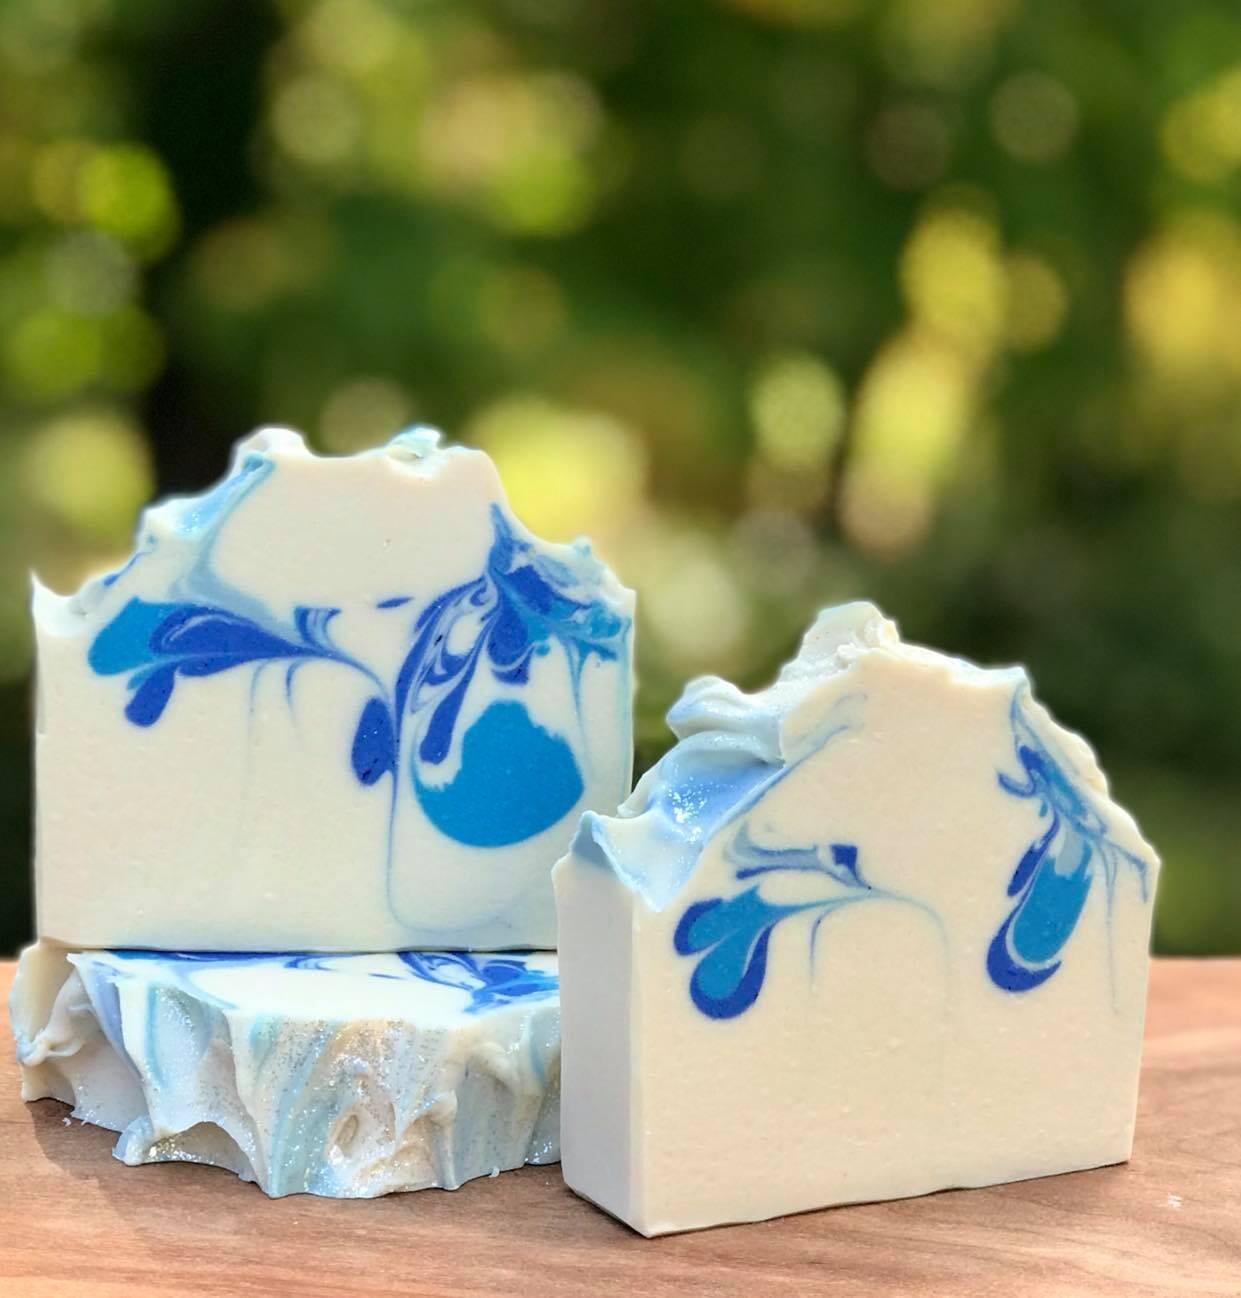 Winter Wonderland - Goat Milk Soap